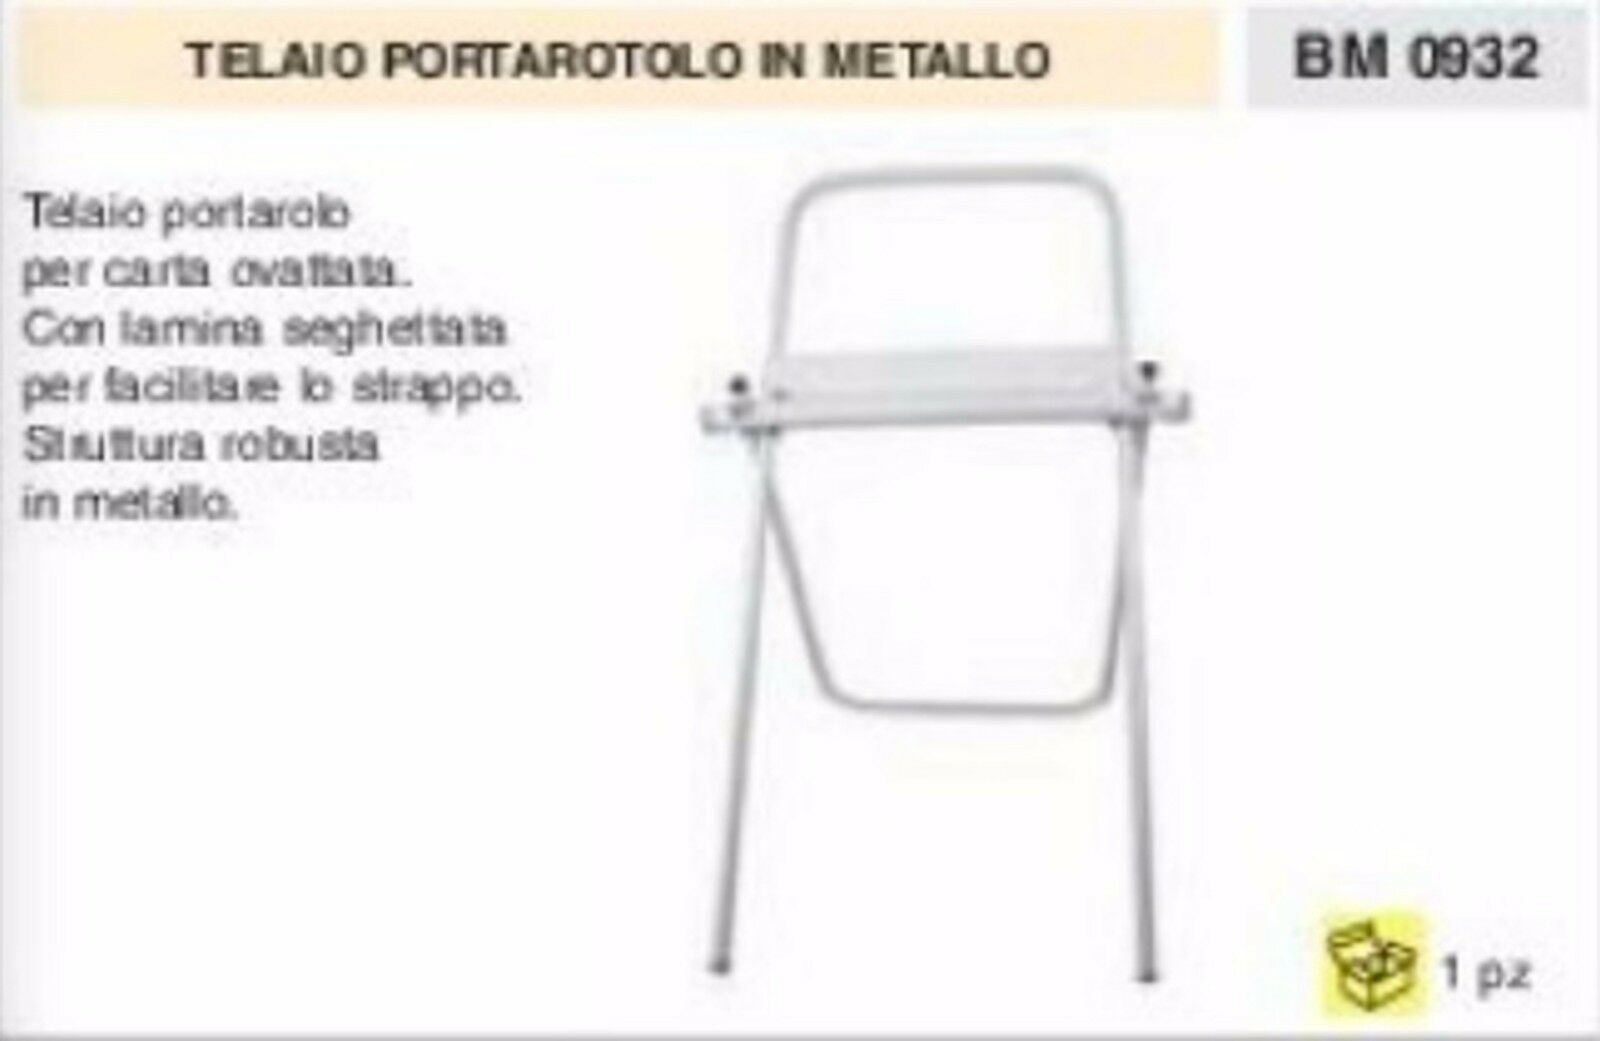 TELAIO PORTAredOLO CARTA OVATTATA porta redolone lamina seghettata OFFICINA